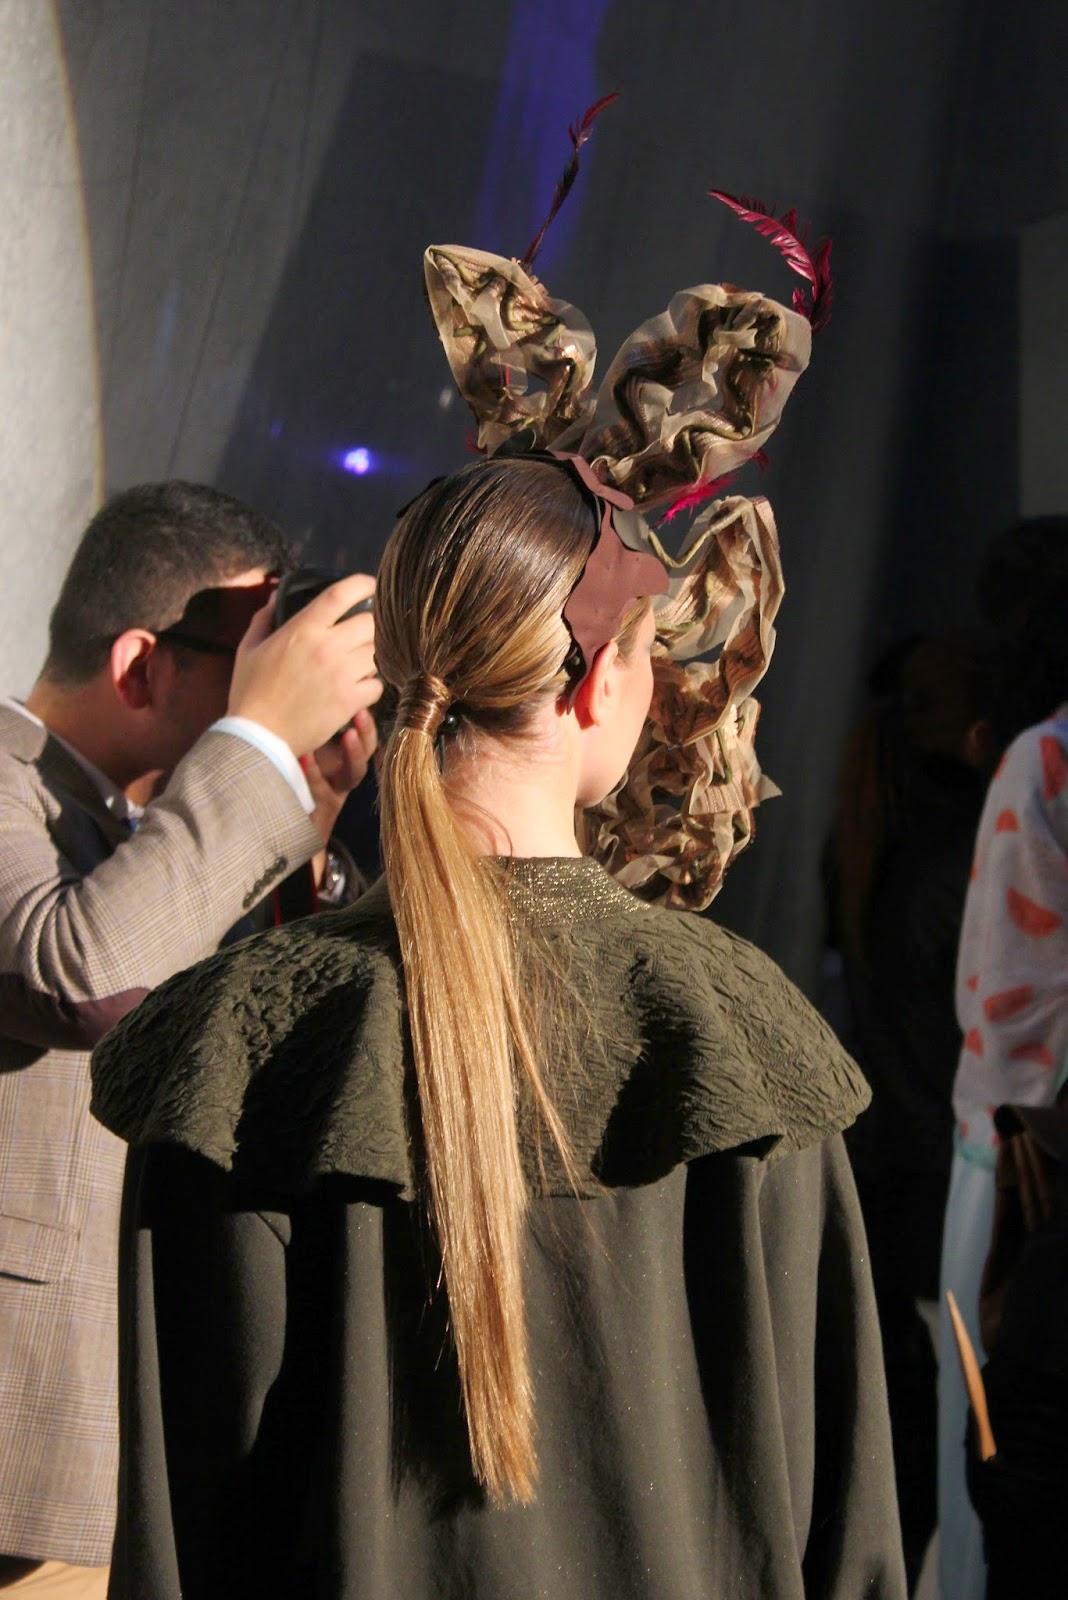 london-fashion-week-lfw-little-shilpa-presentation-models-dresses-collection-spring-summer-2015-ss15-me-hotel